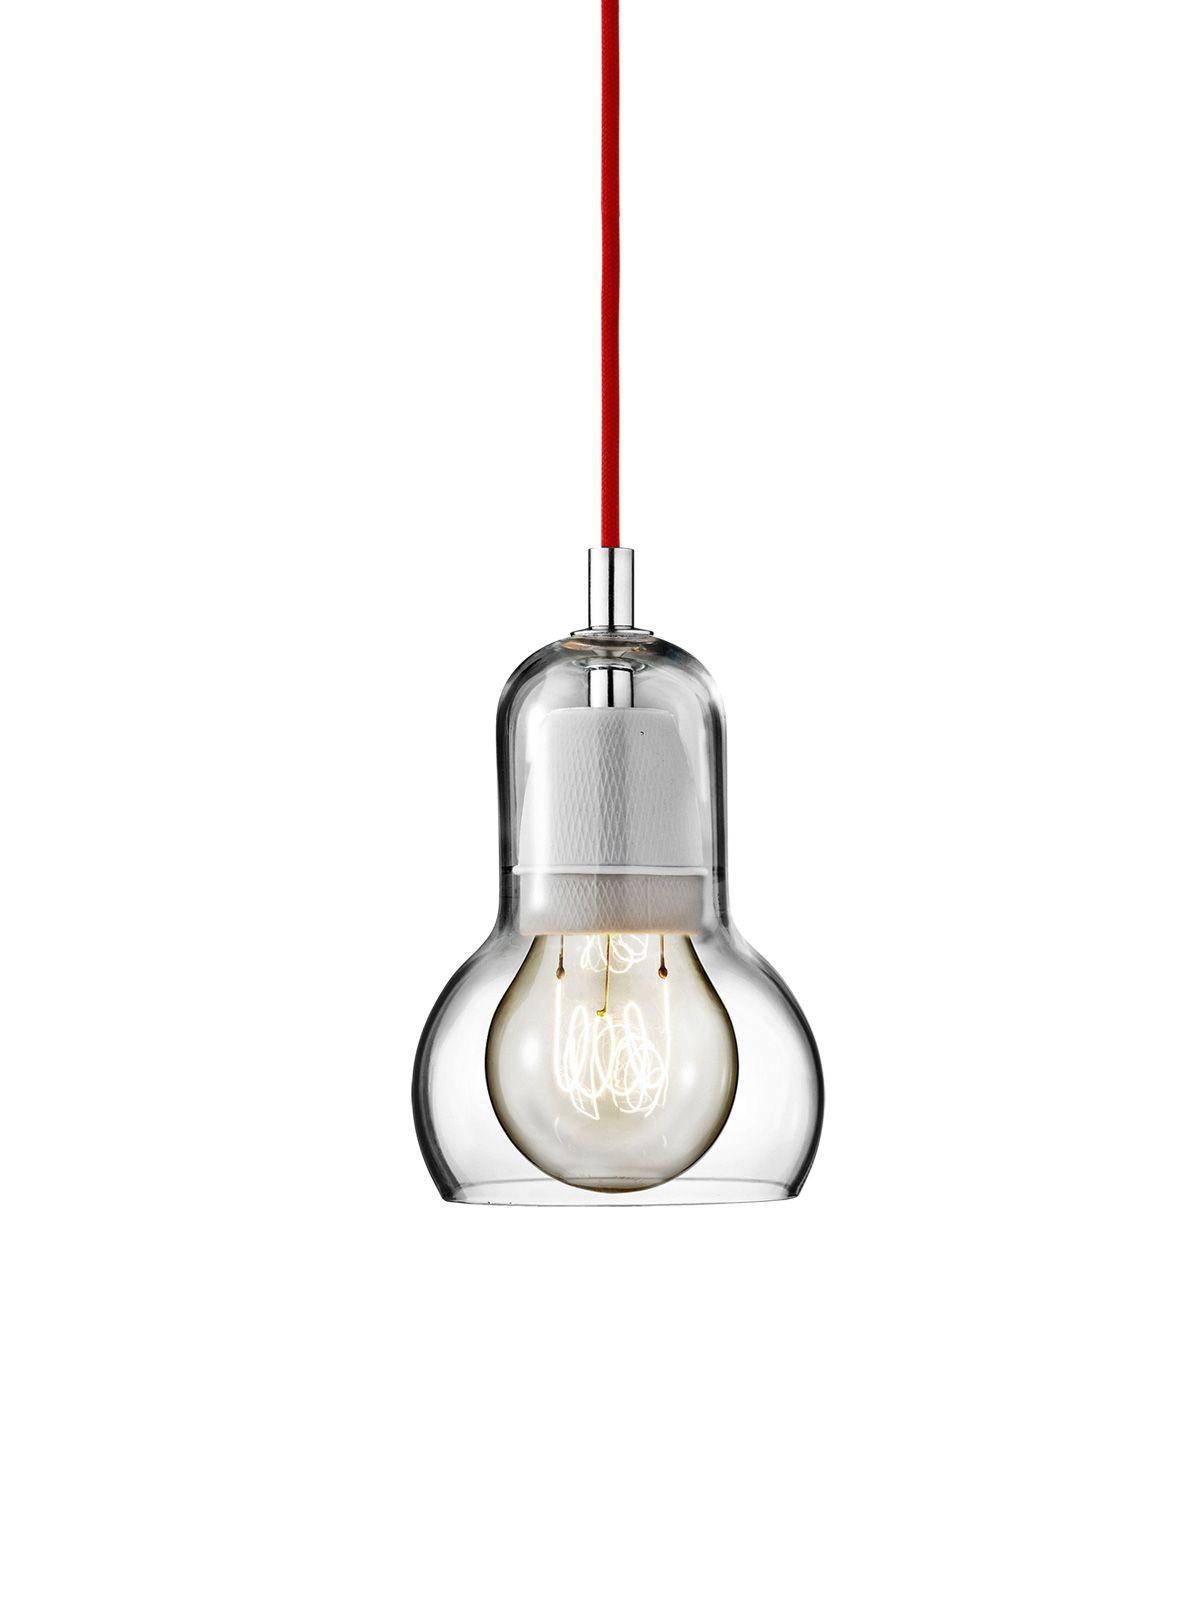 Designort Lampen Leuchten Designerleuchten Berlin Design Lampen Und Leuchten Design Leuchten Coole Beleuchtung